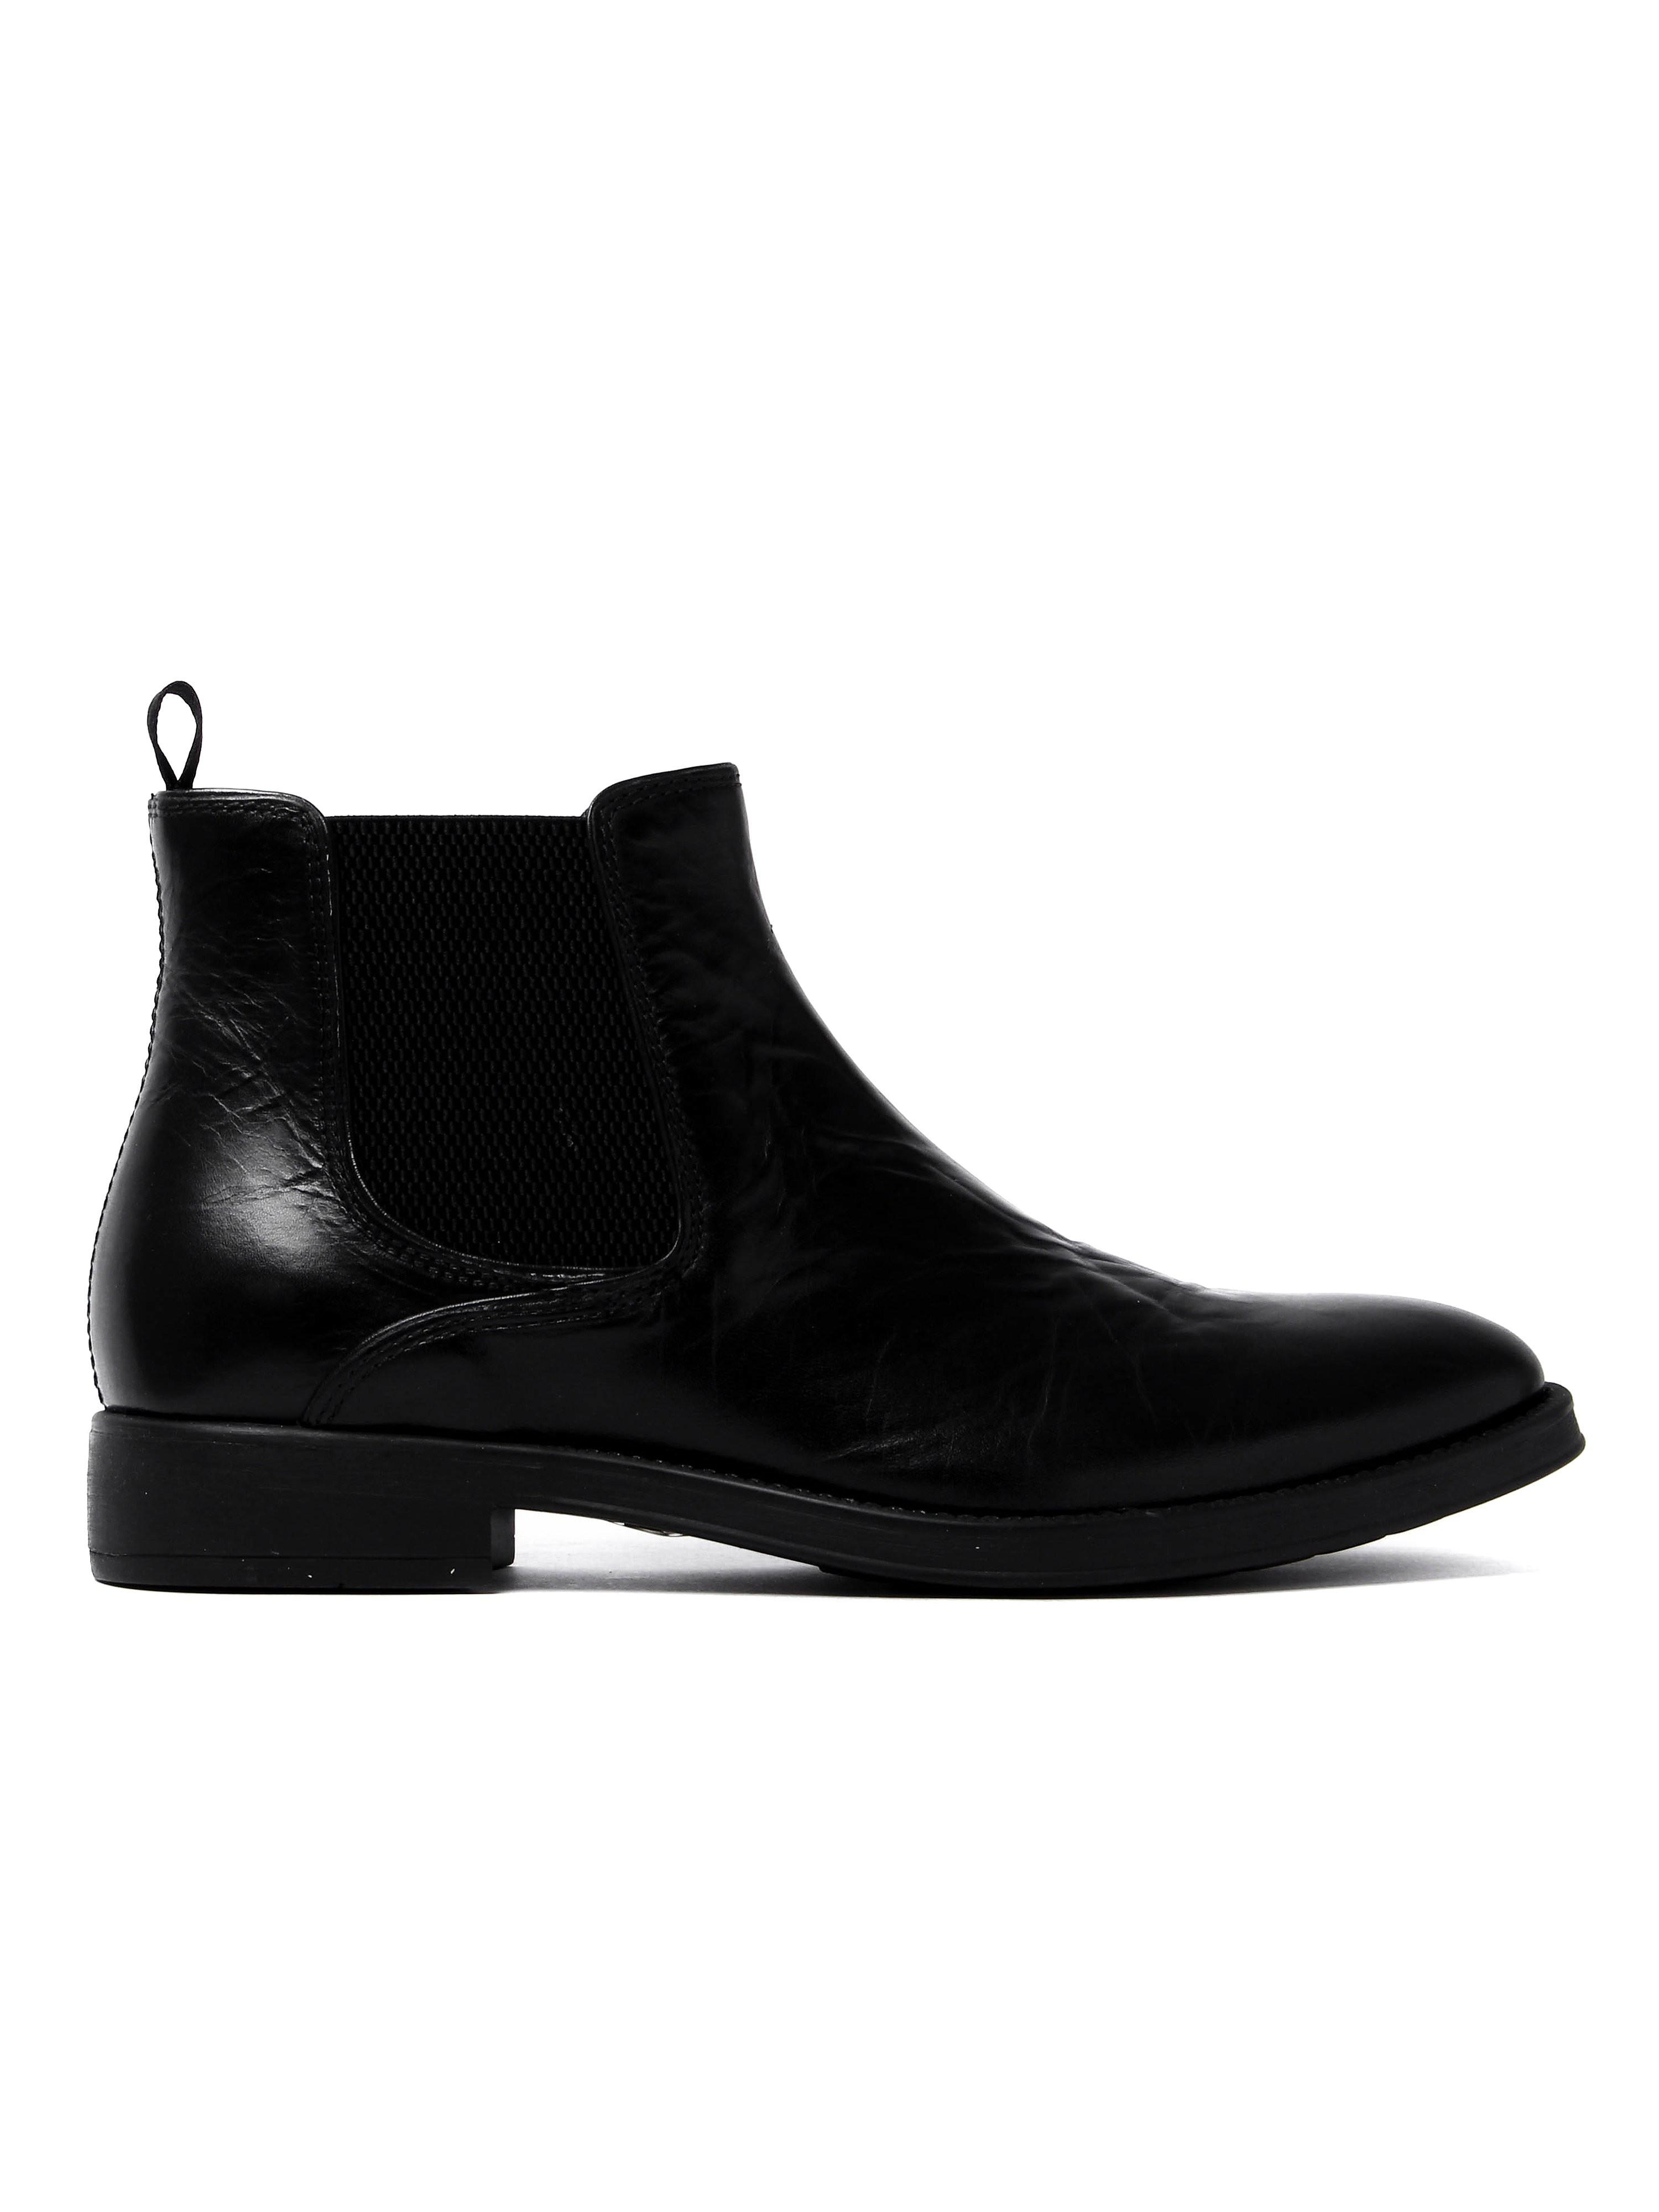 Geox Men's Blaxe Chelsea Boots - Black Leather